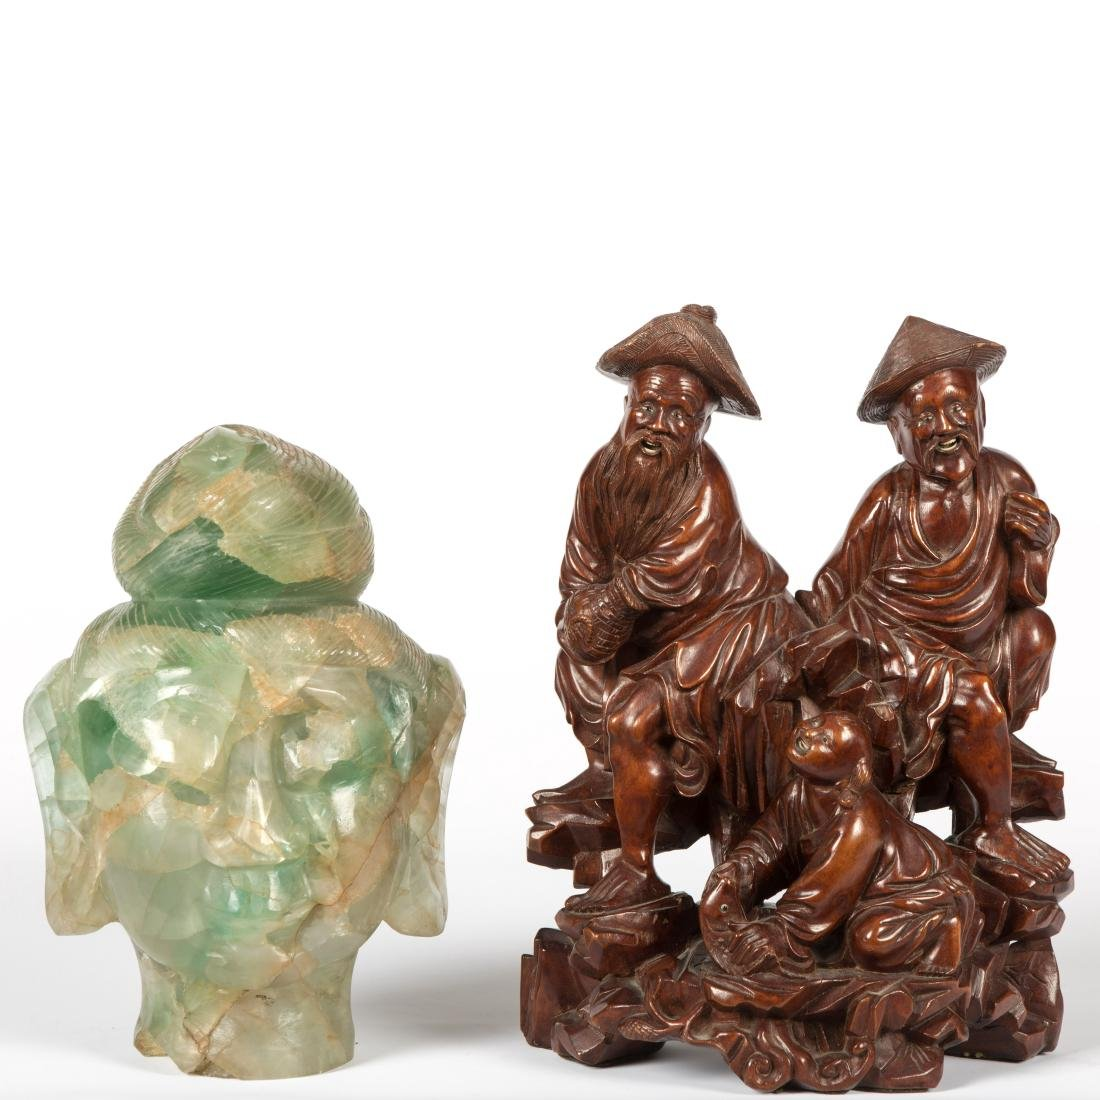 Chinese Wood Carving - Jade Quan Yin